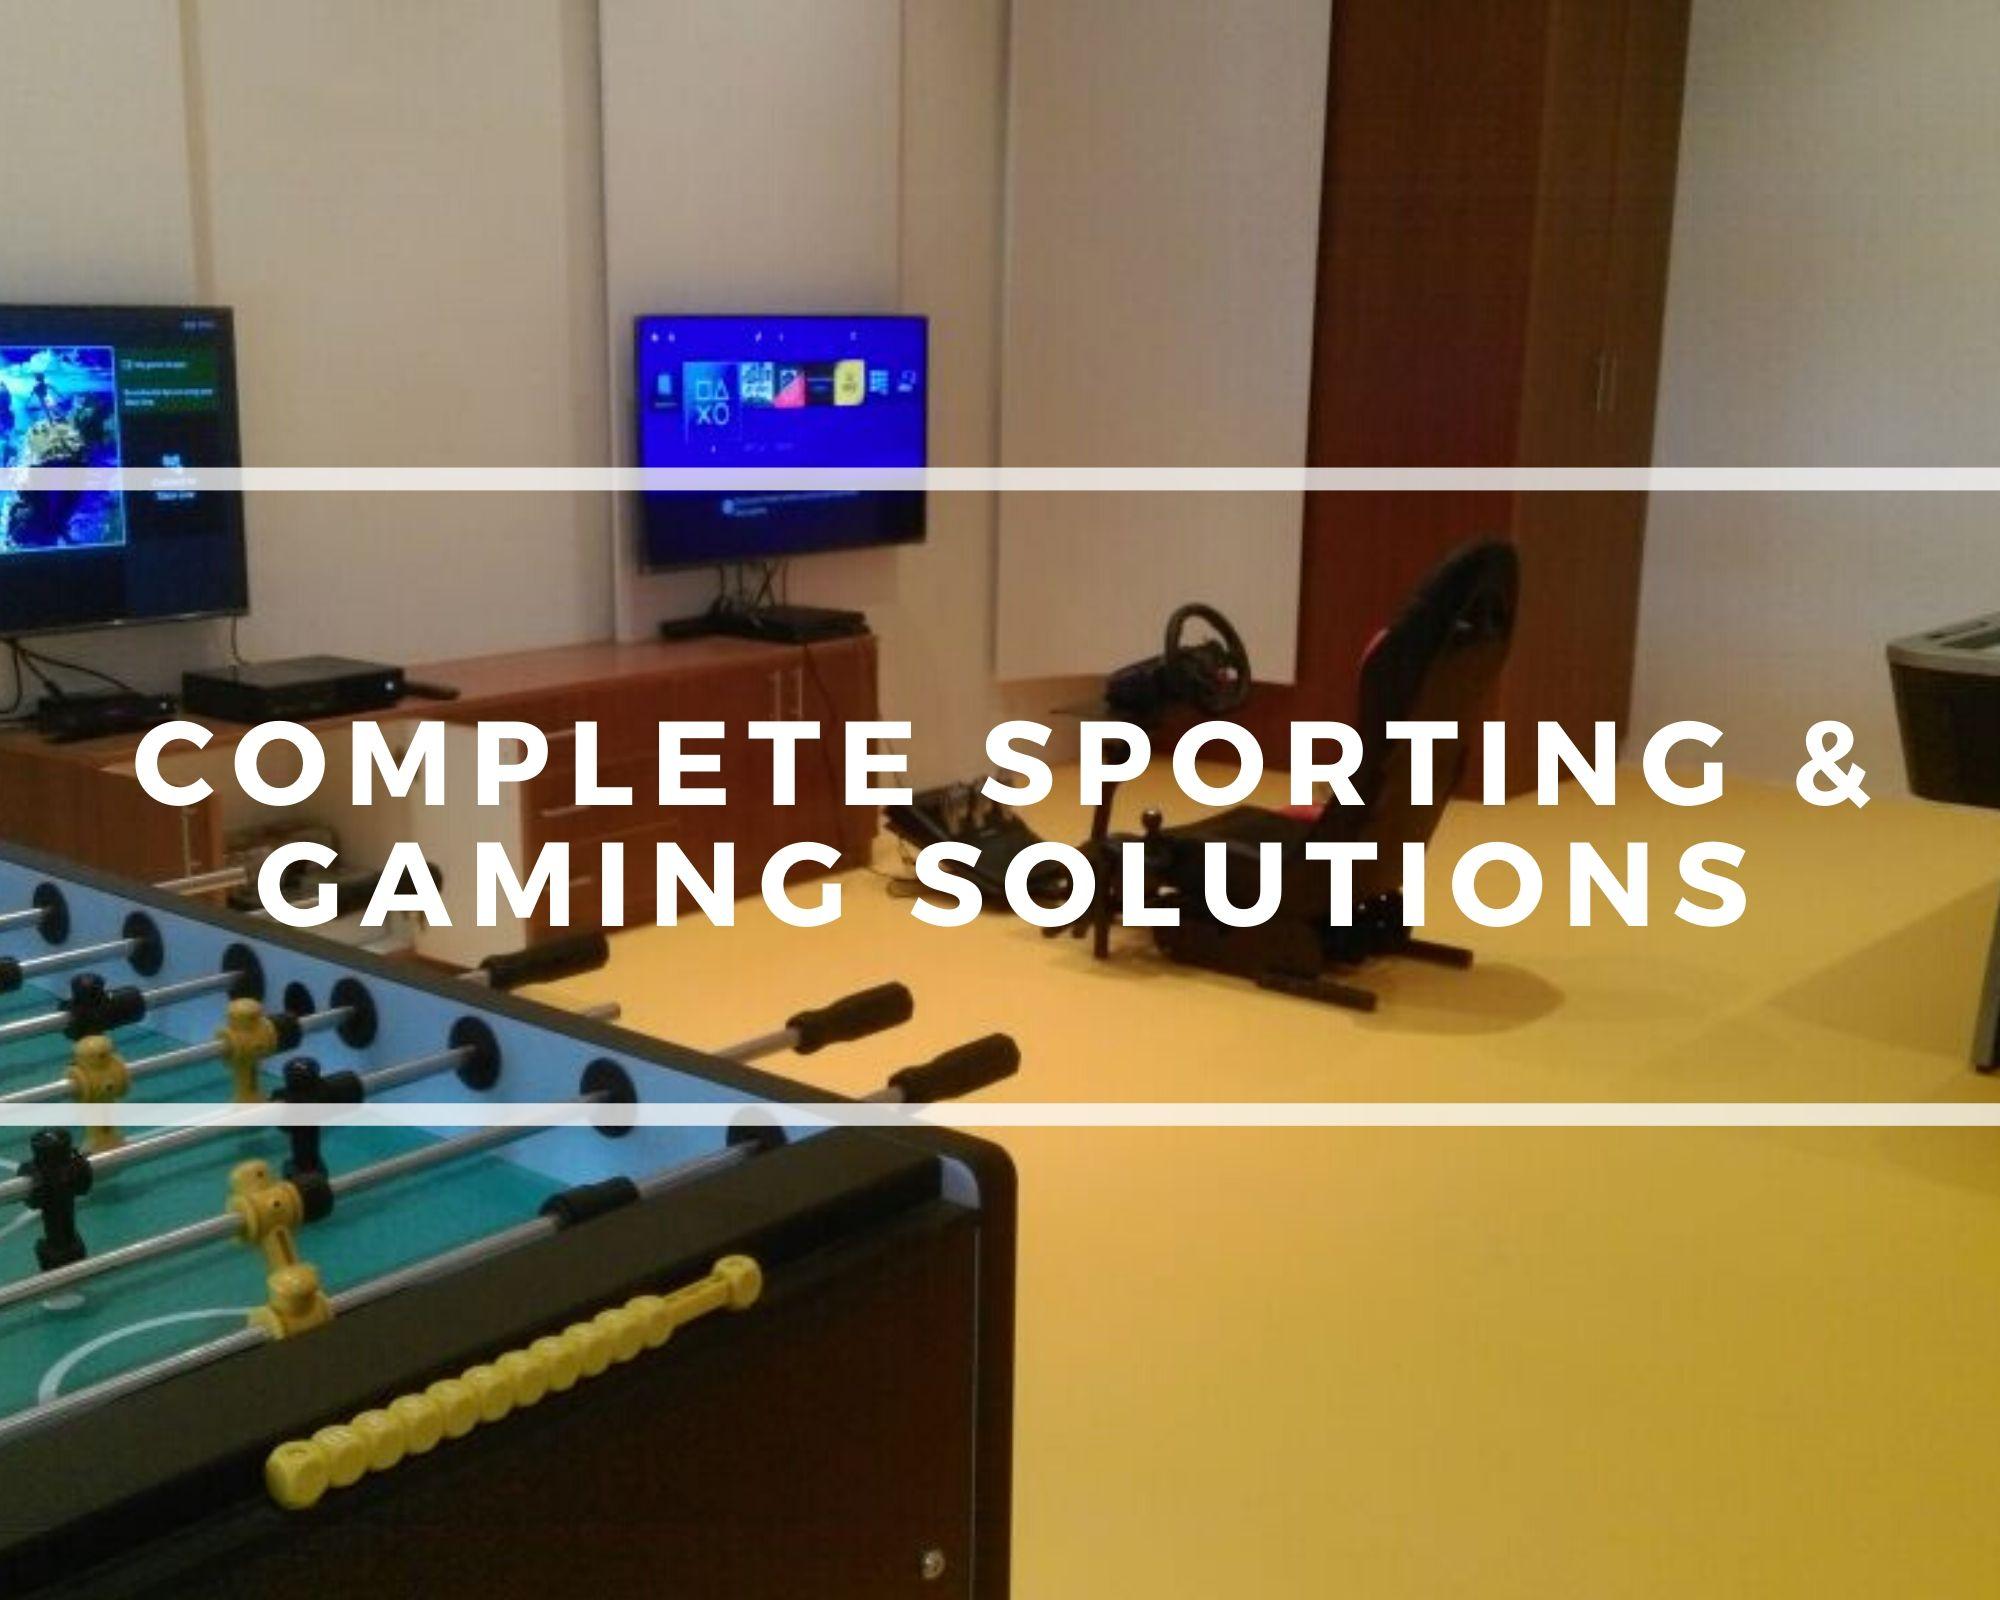 Carousel-Complete Sporting & Gaming Solu